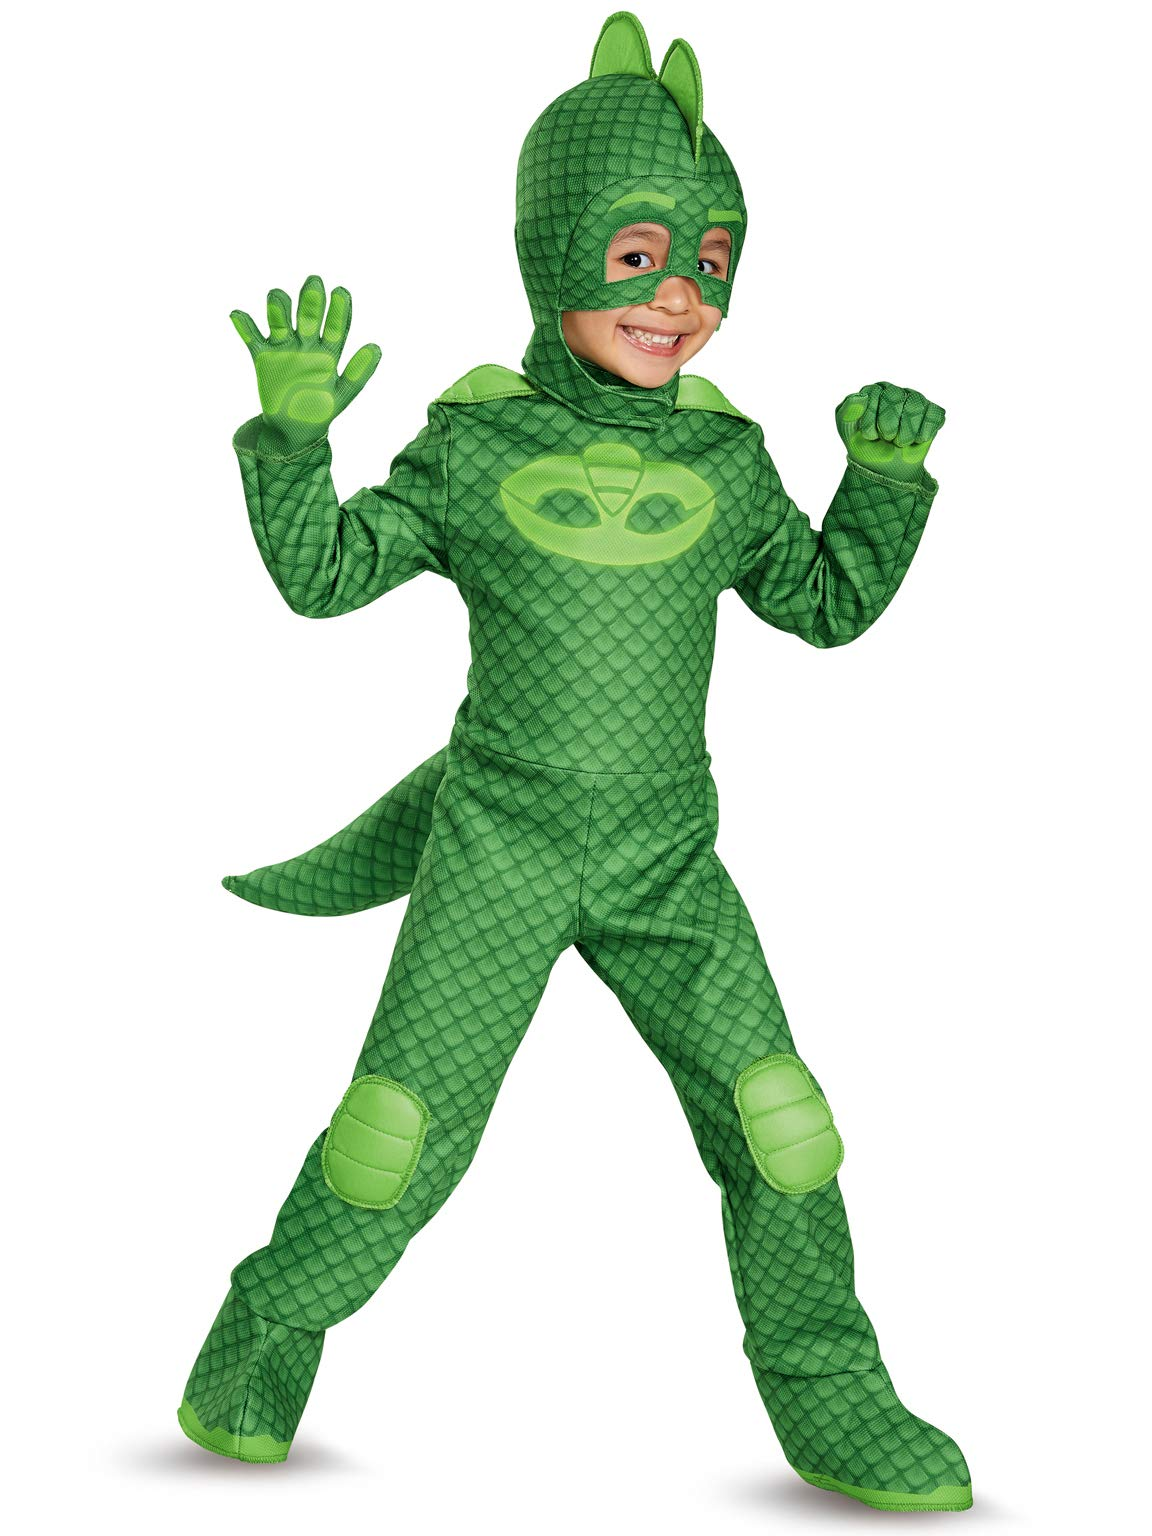 Gekko Deluxe Toddler PJ Masks Costume, Large/4-6